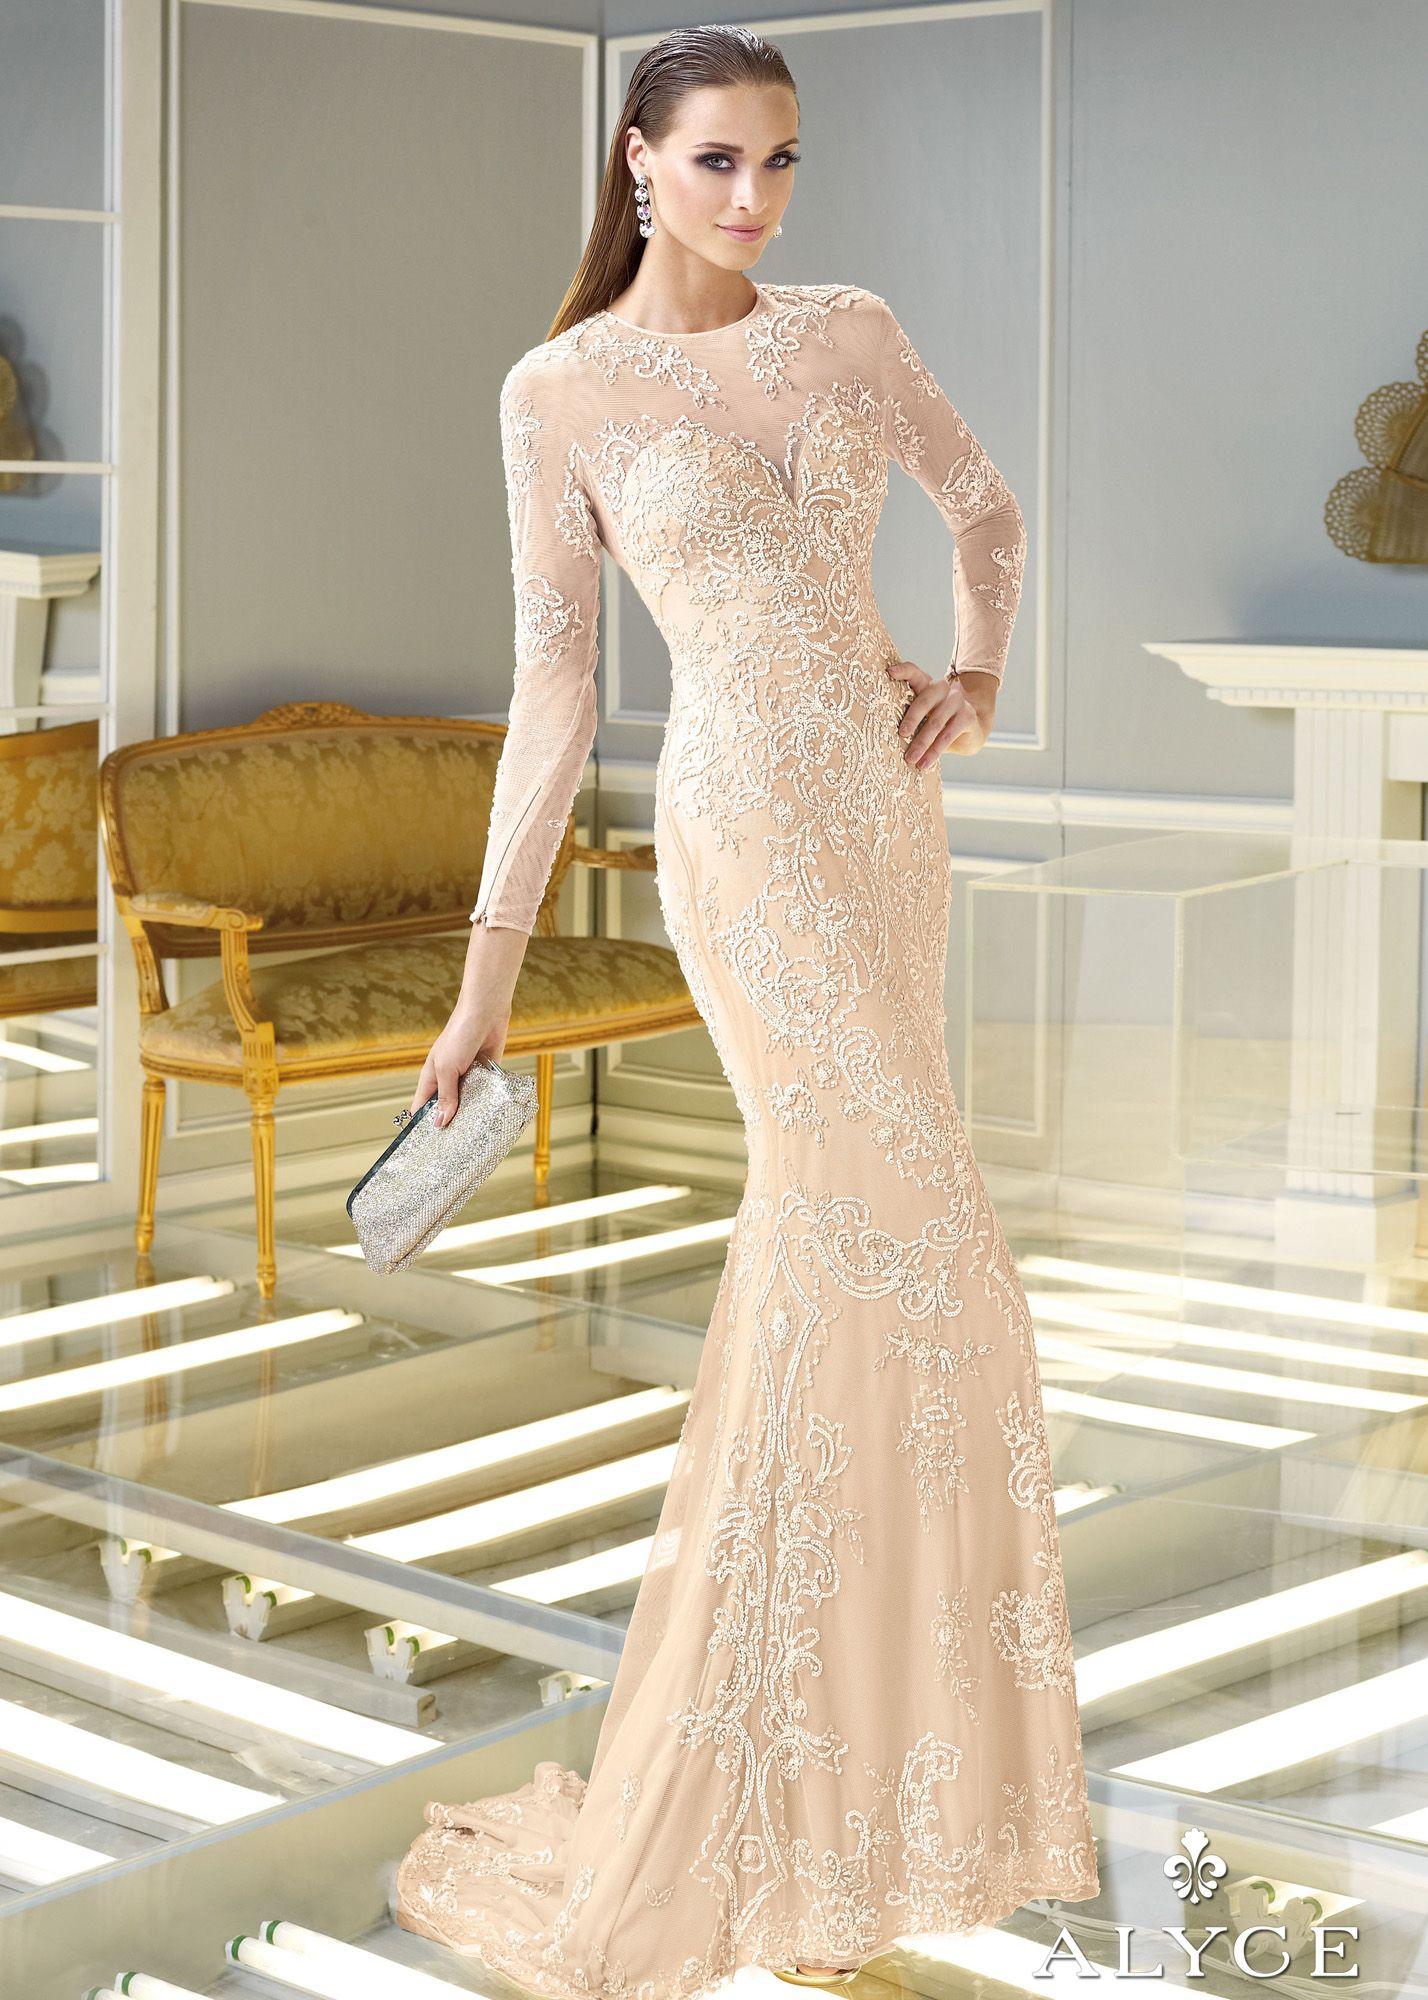 Claudine for Alyce 2289 - Champagne Beaded Sheer Mesh Prom Dresses Online 84c48926e